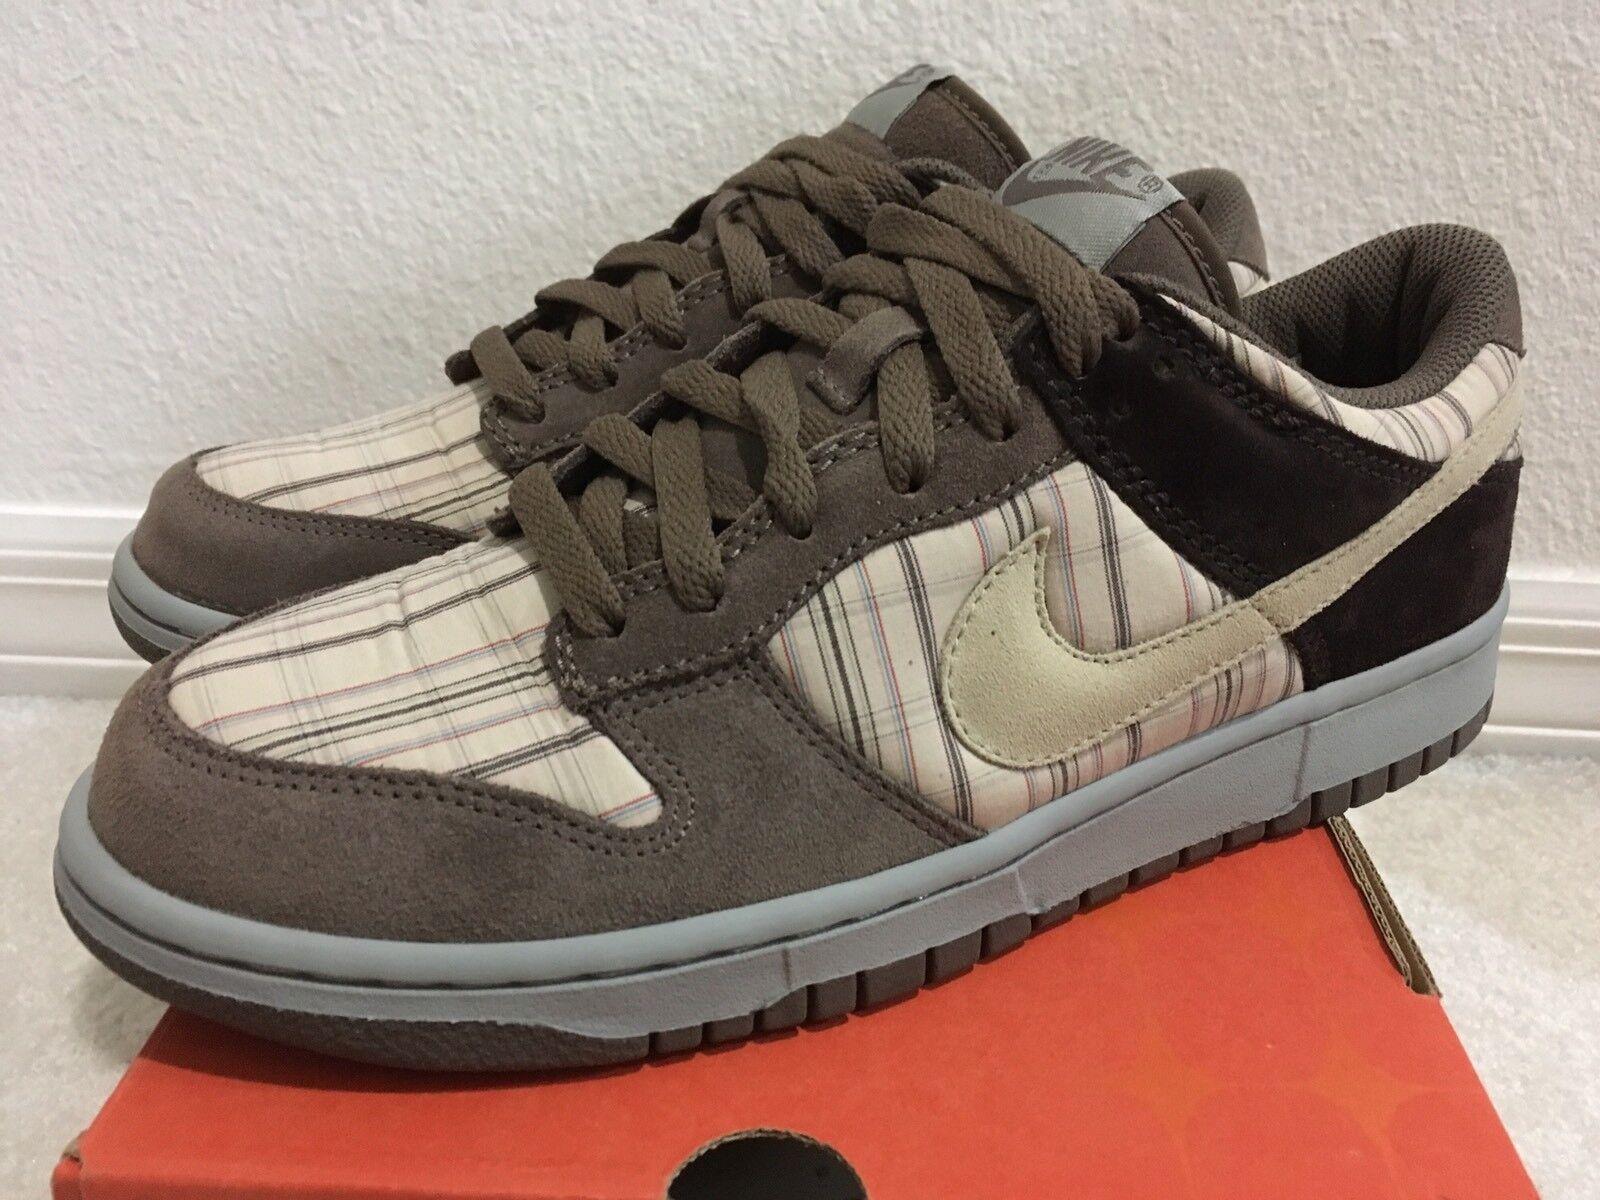 Nike Dunk Low Premium Net Palomino Plaid Brown Men Sz 9.5 307696-111